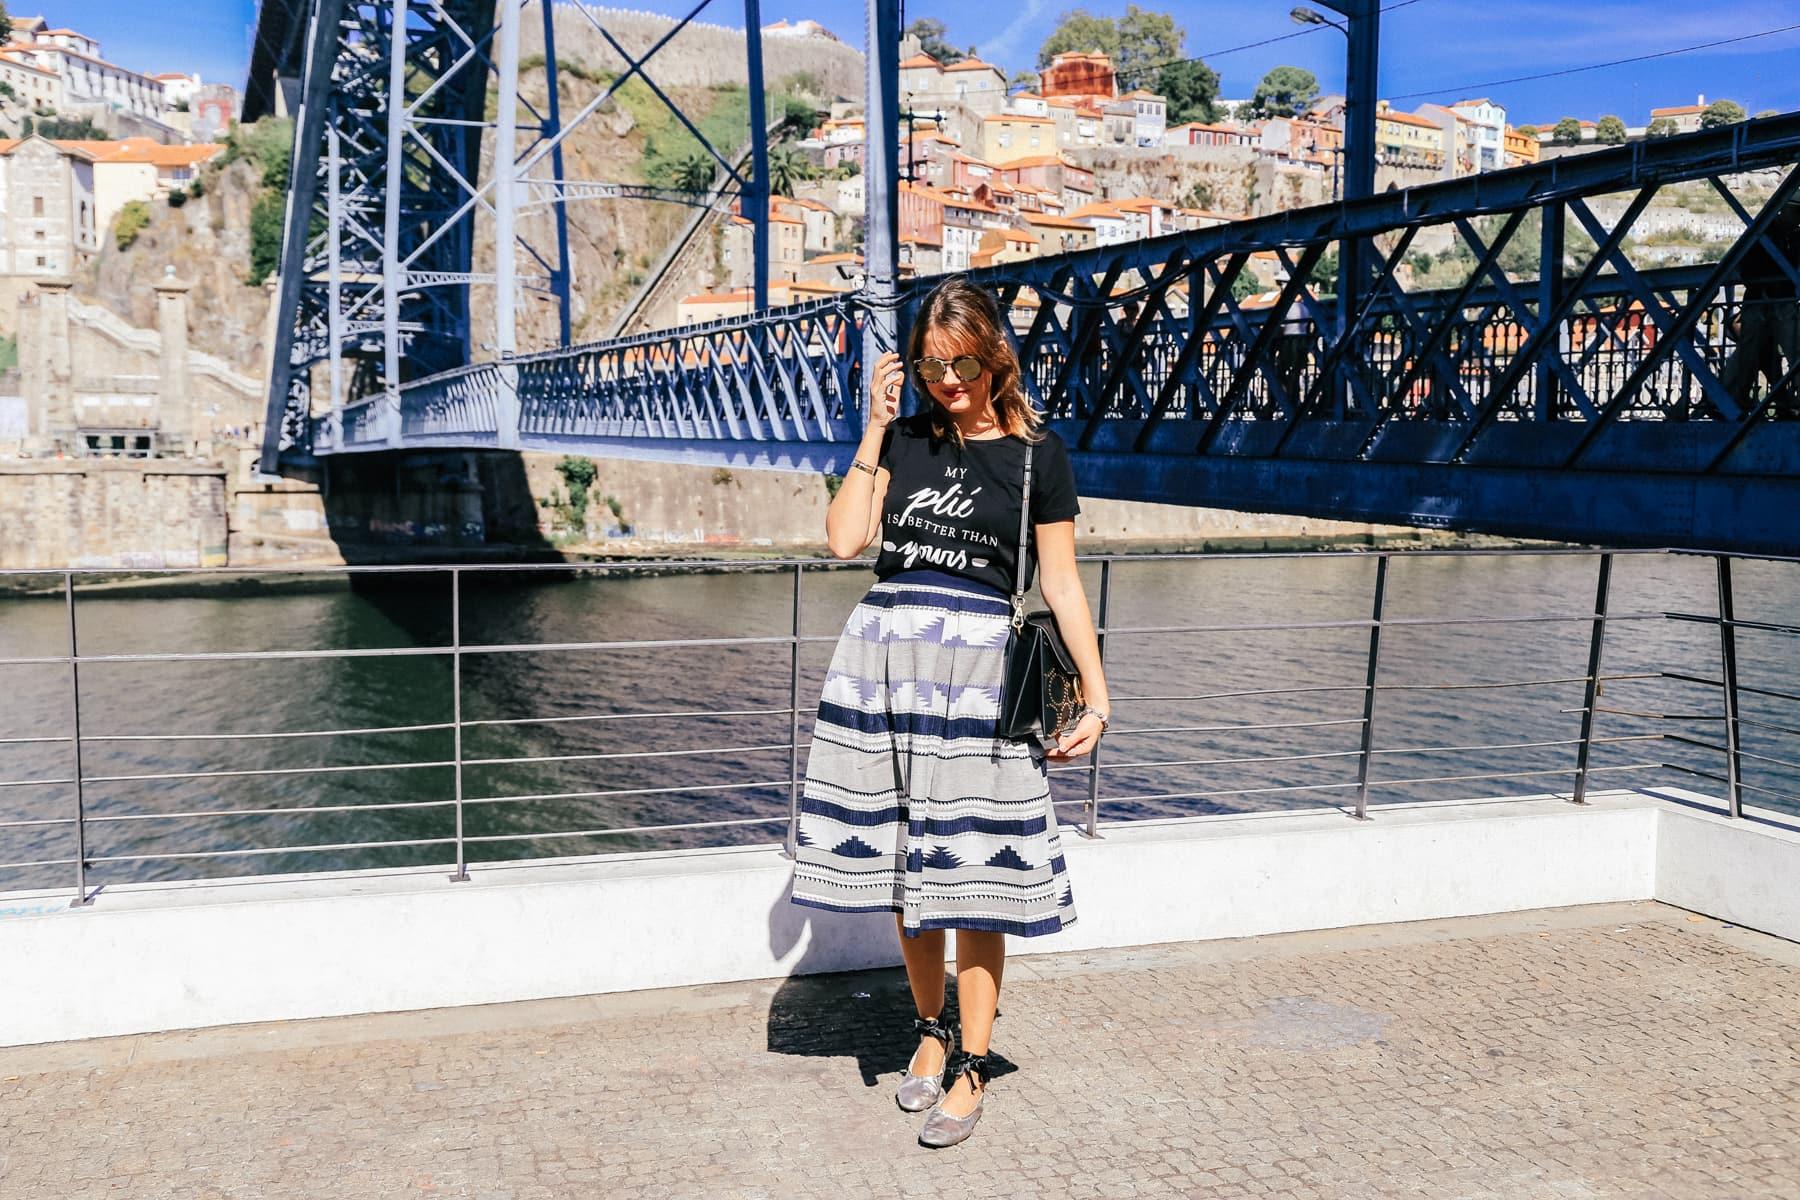 zehn-porto-tipps-fuer-deine-staedtereise-in-portugal-reiseblog-des-belles-choses 56